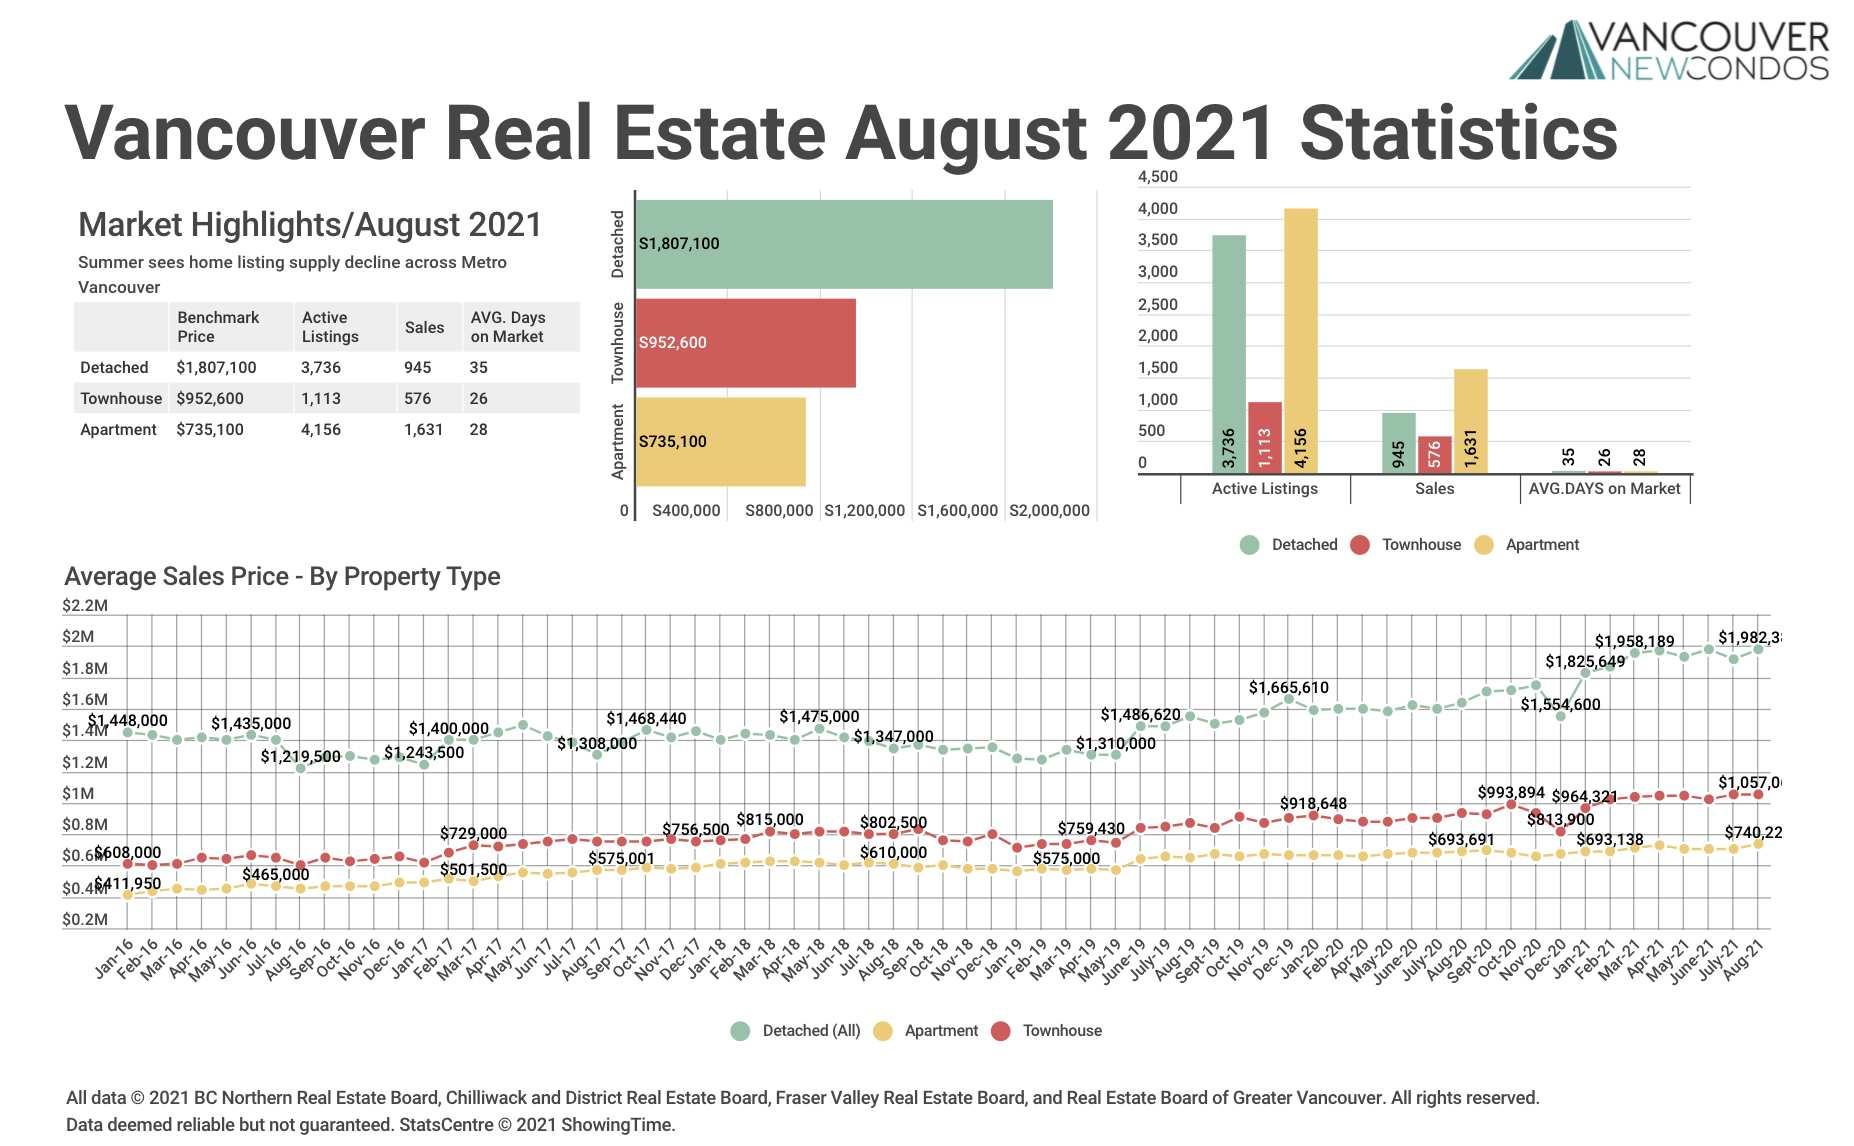 Aug 21 REBGV Stats Graph